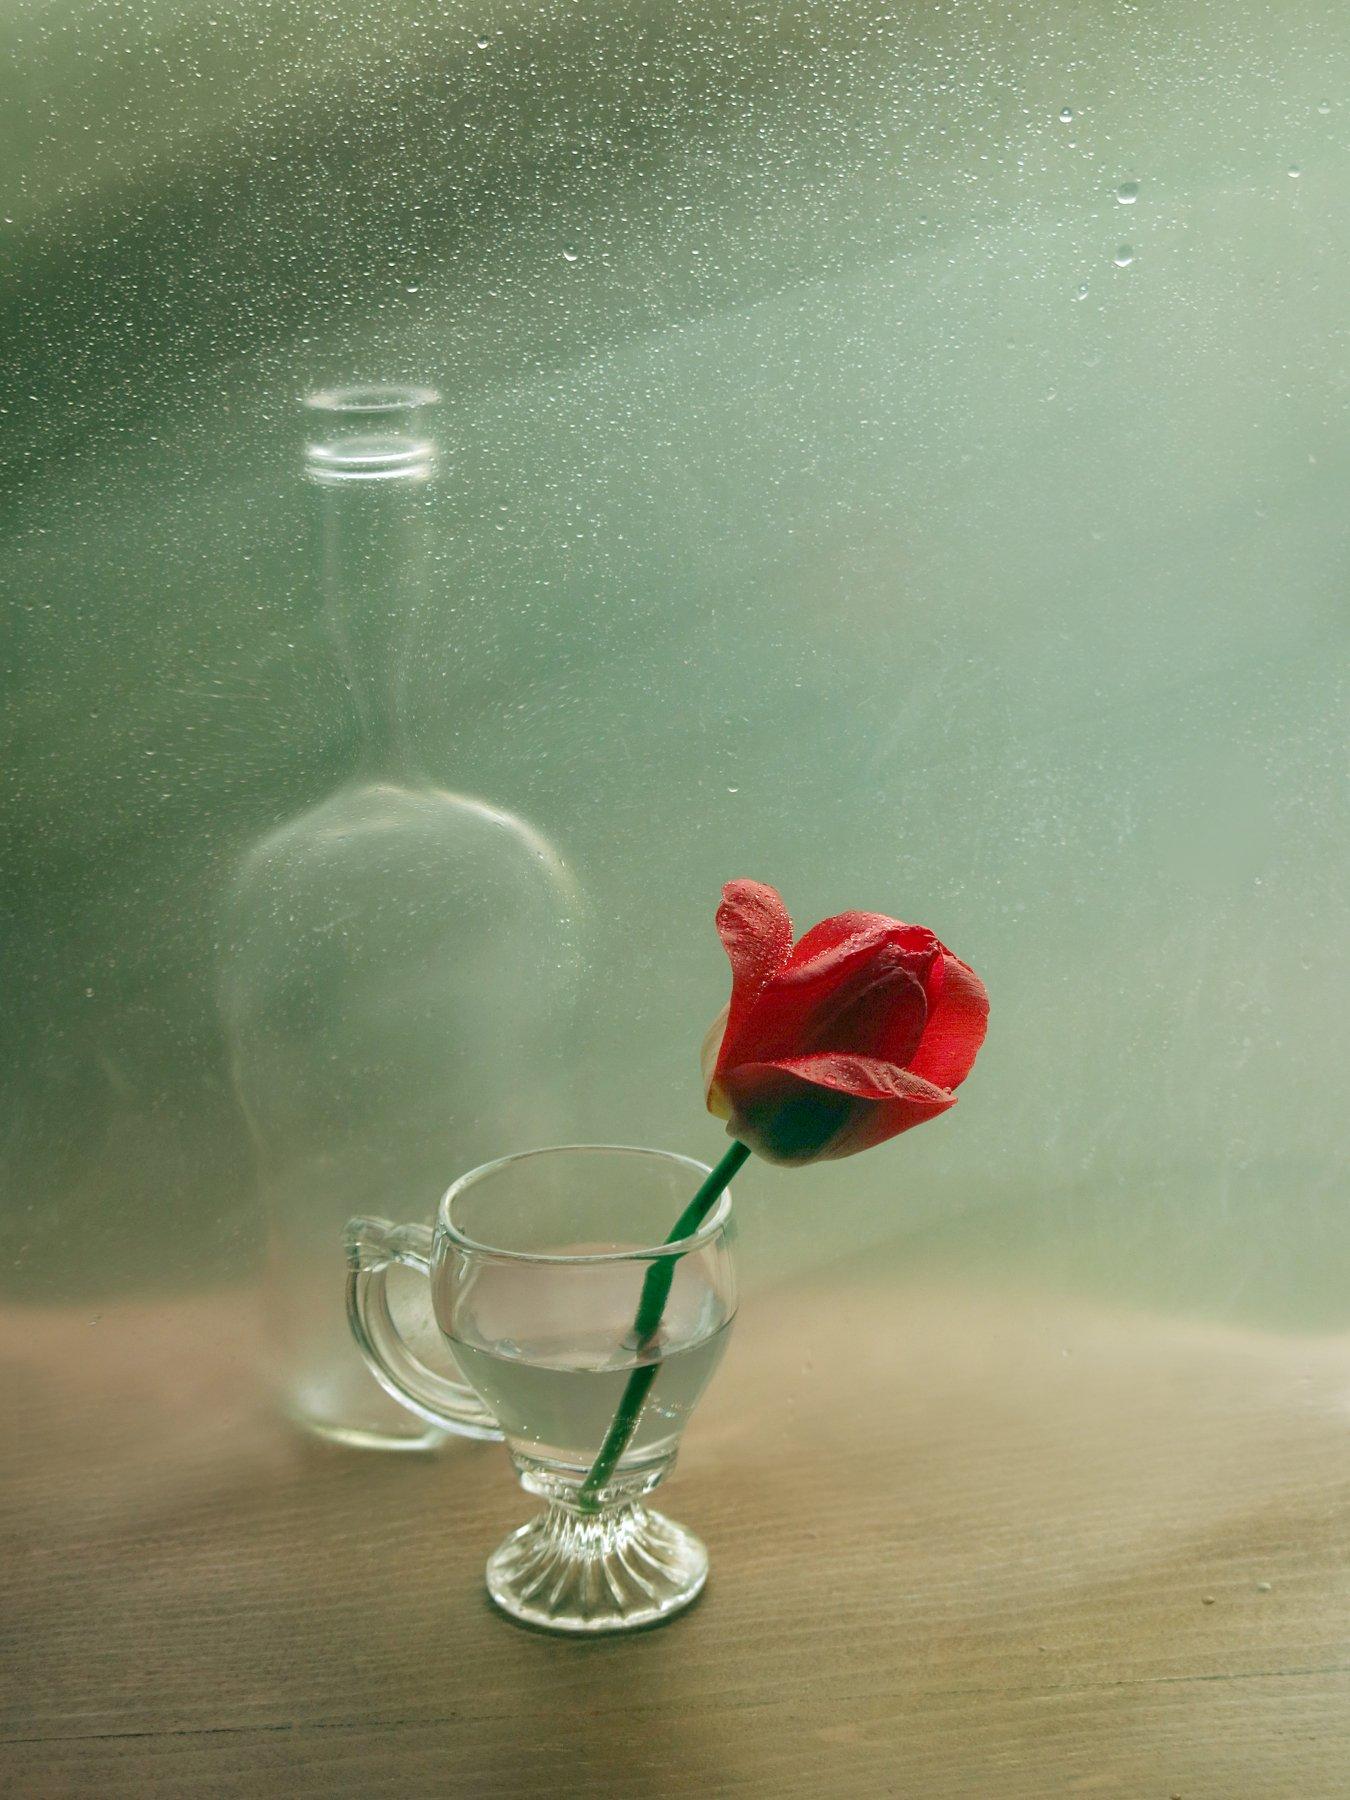 тюльпан, бутылка, капли, вода, натюрморт, Елена